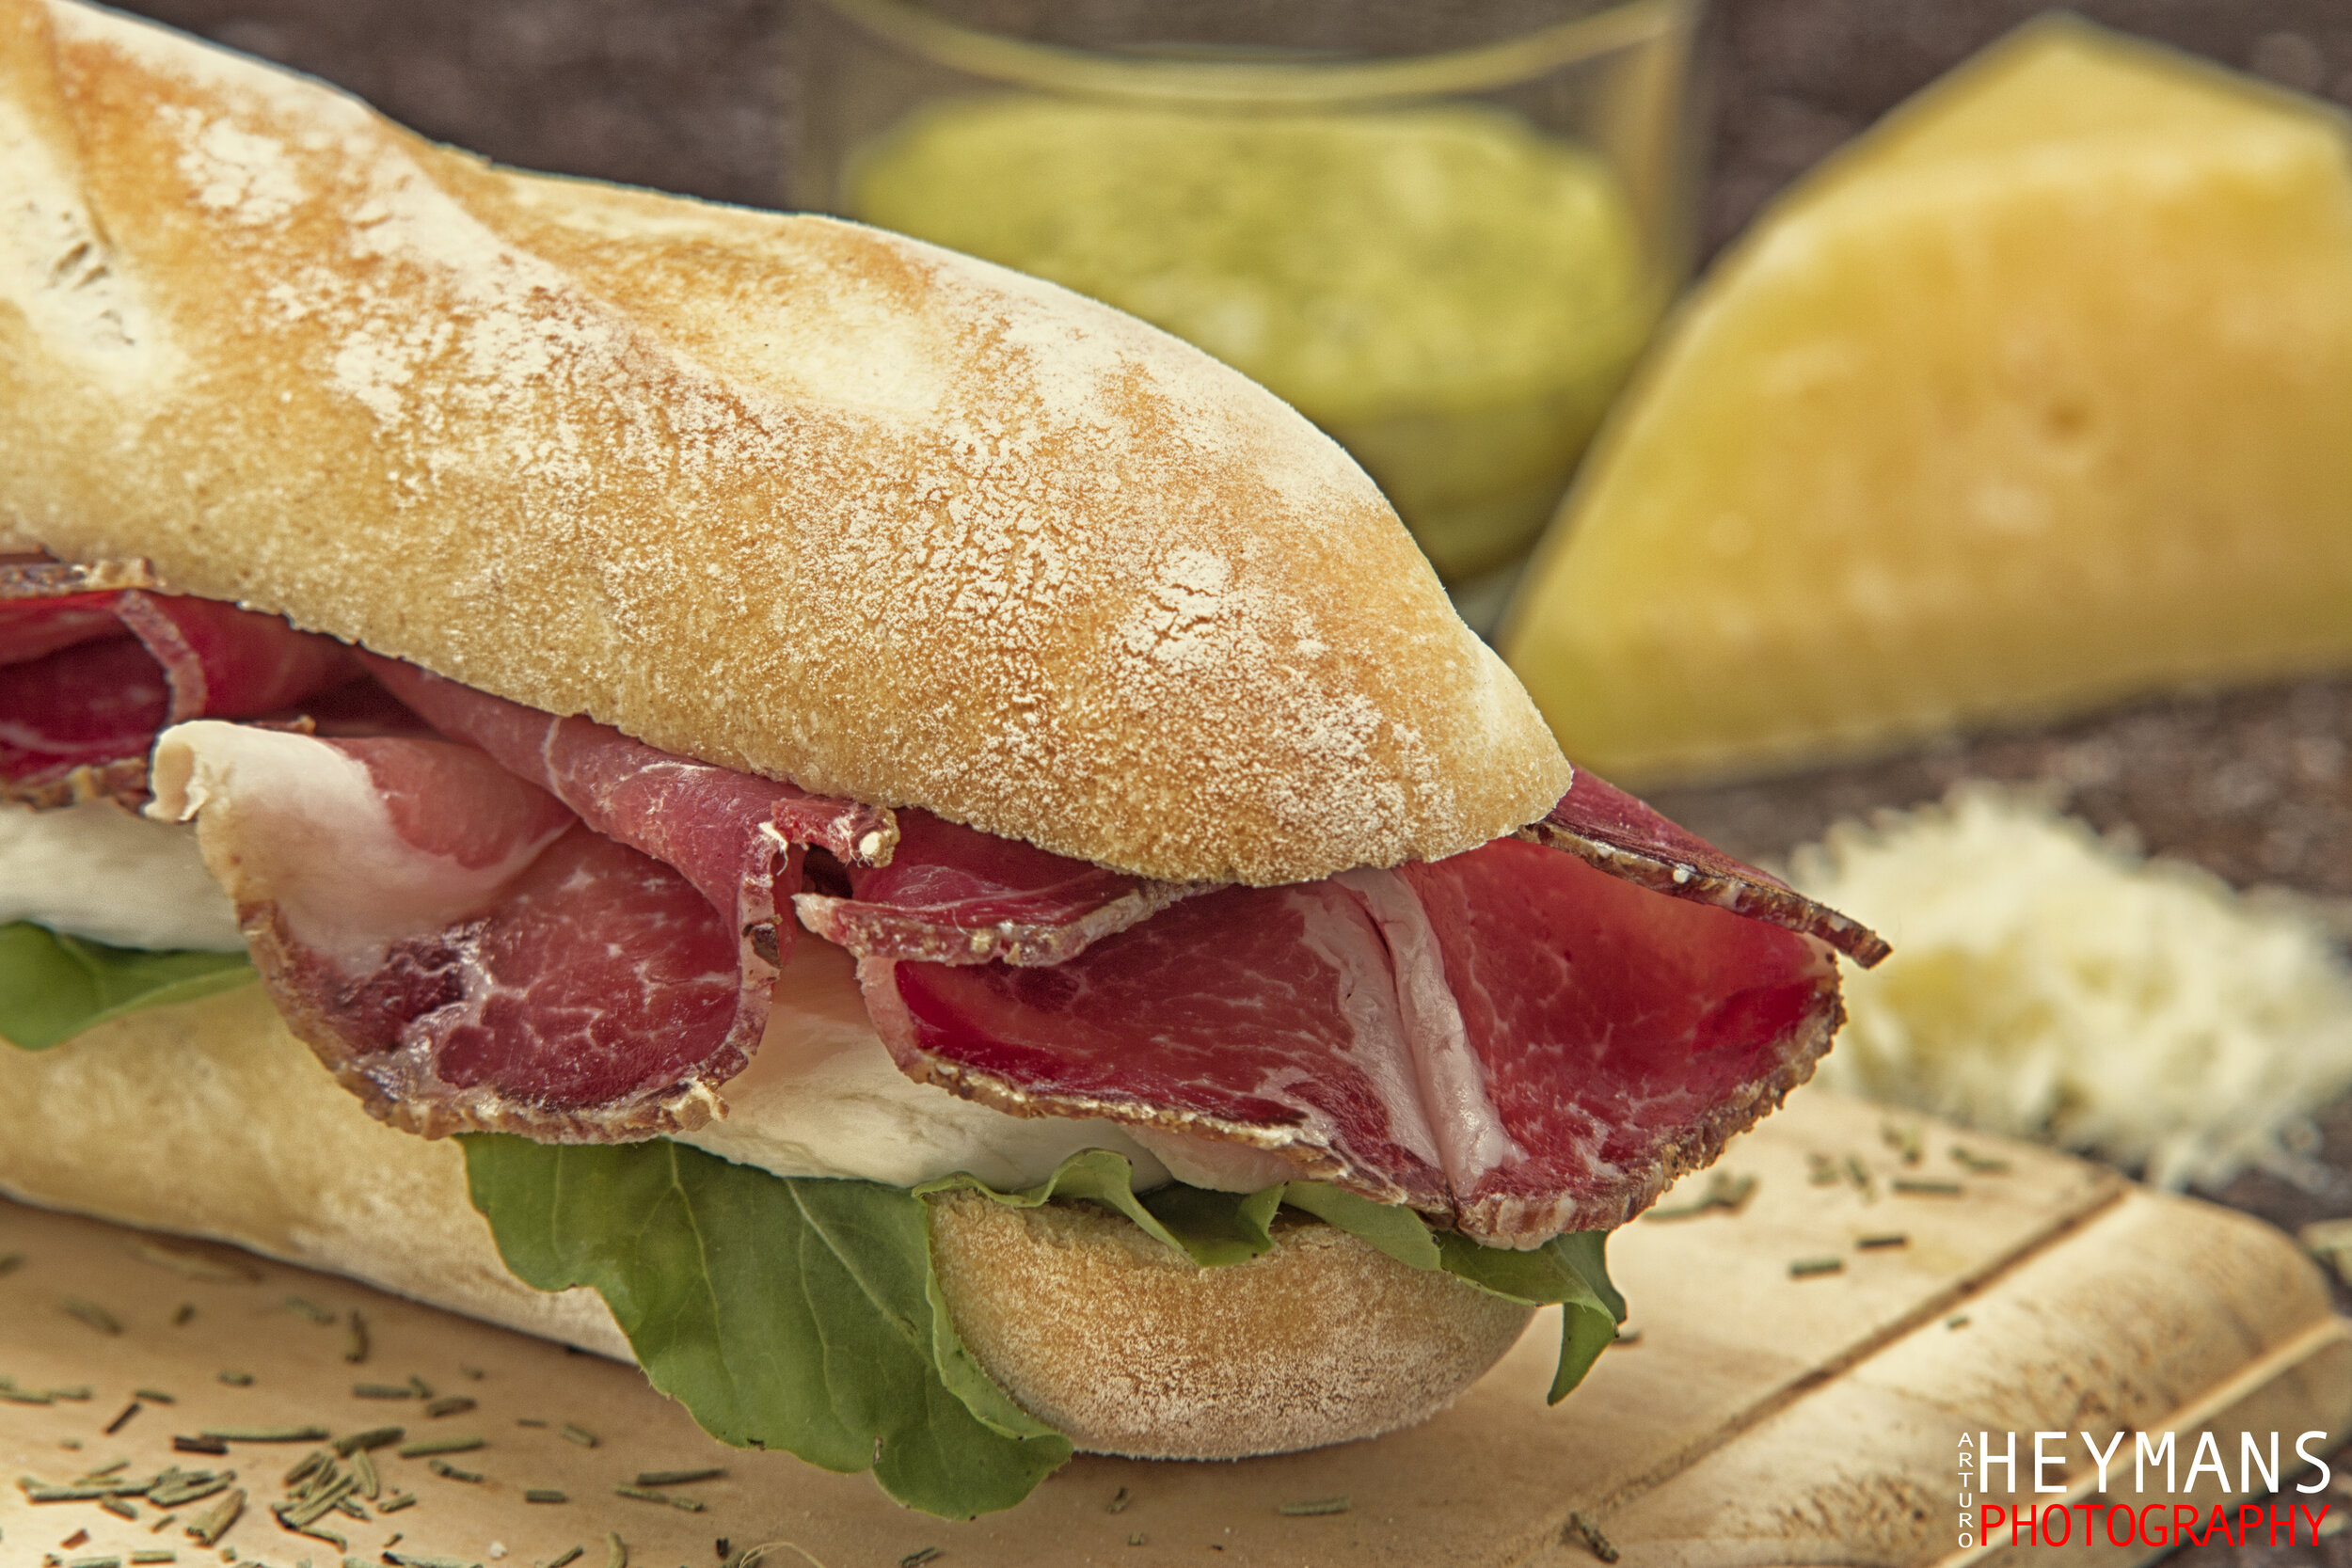 Sandwich-12960-Edit.jpg